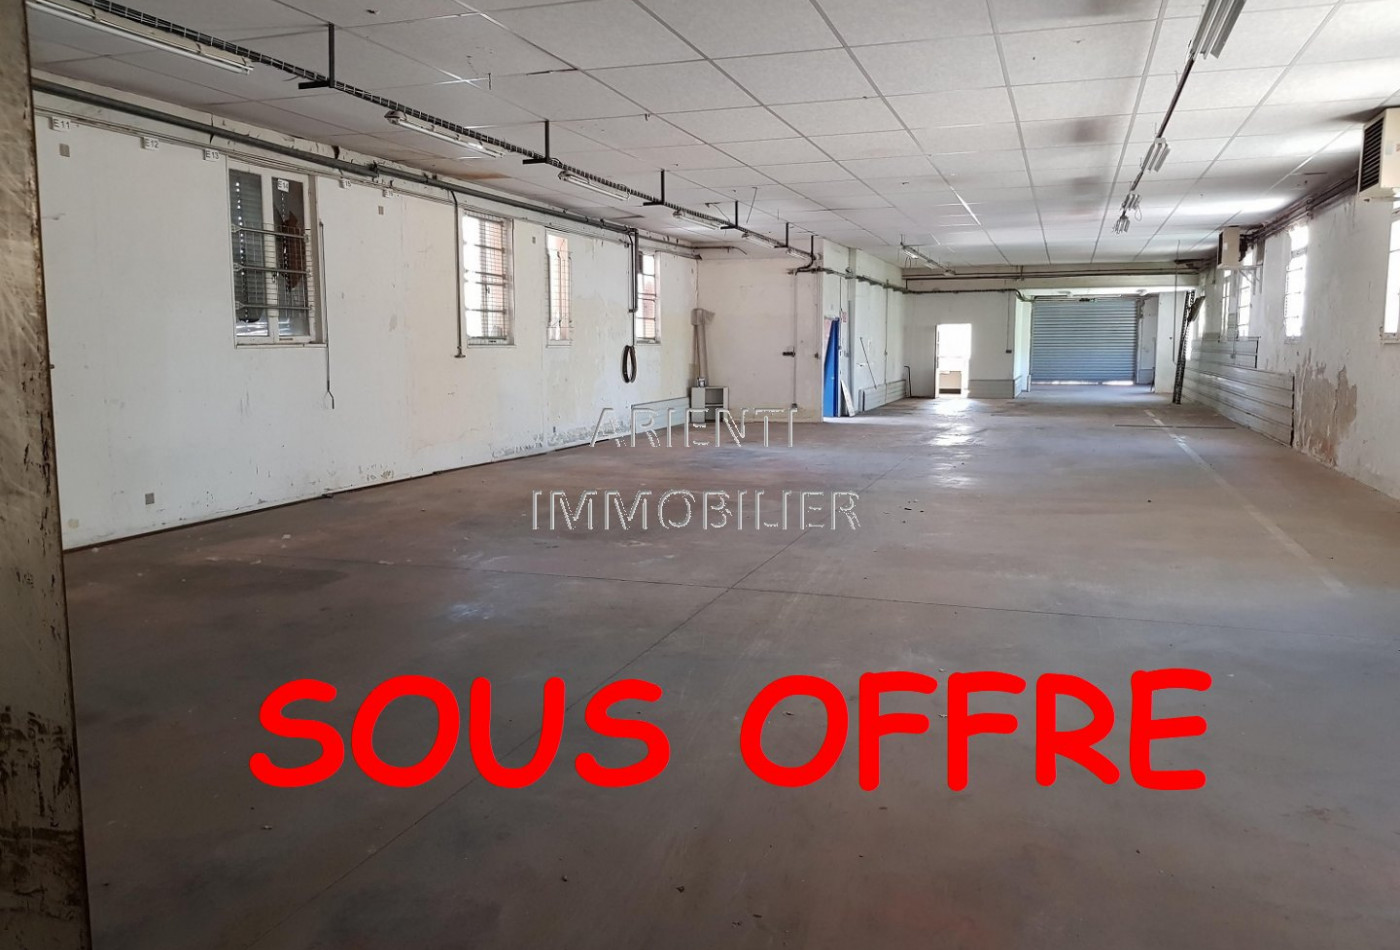 A vendre  Valreas | Réf 260013487 - Office immobilier arienti